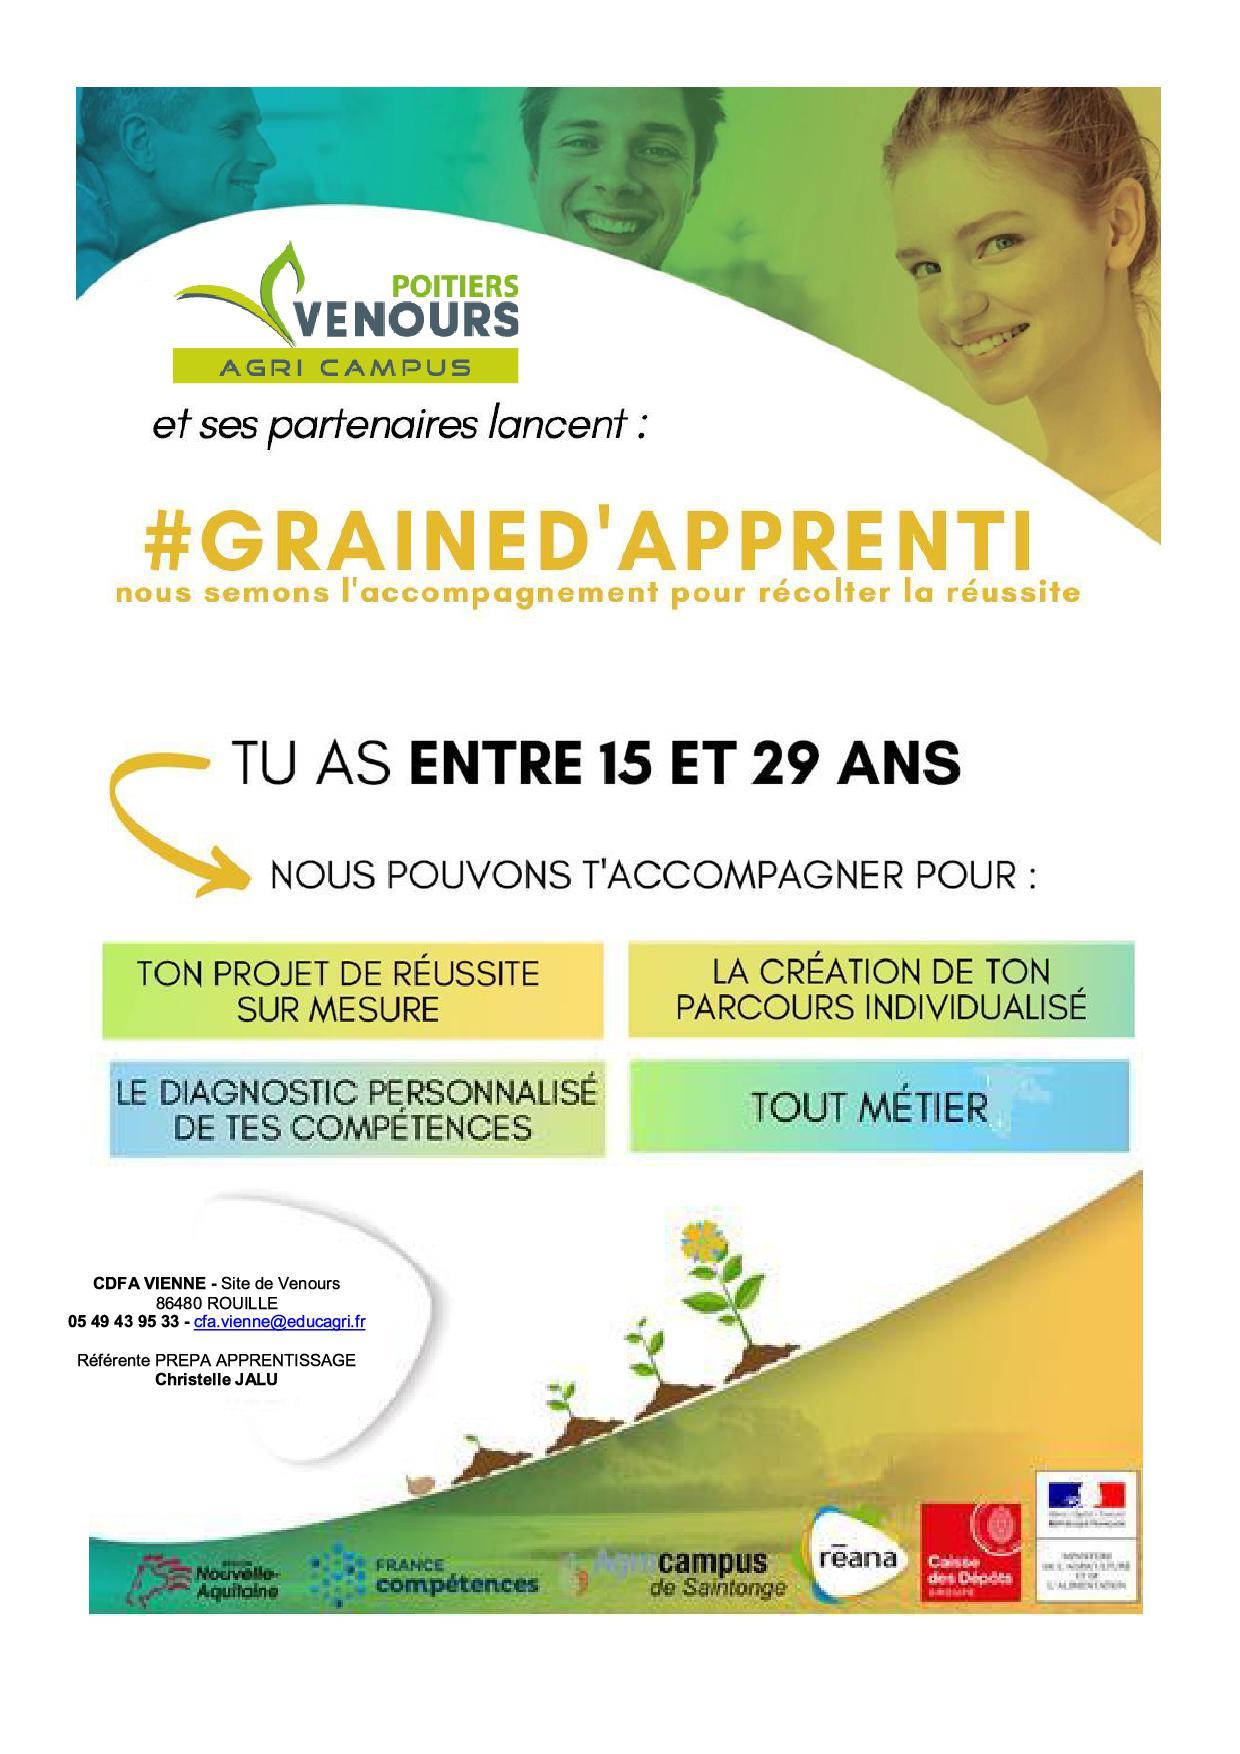 Prepa Apprentissage - Agri Campus Venours - Vienne